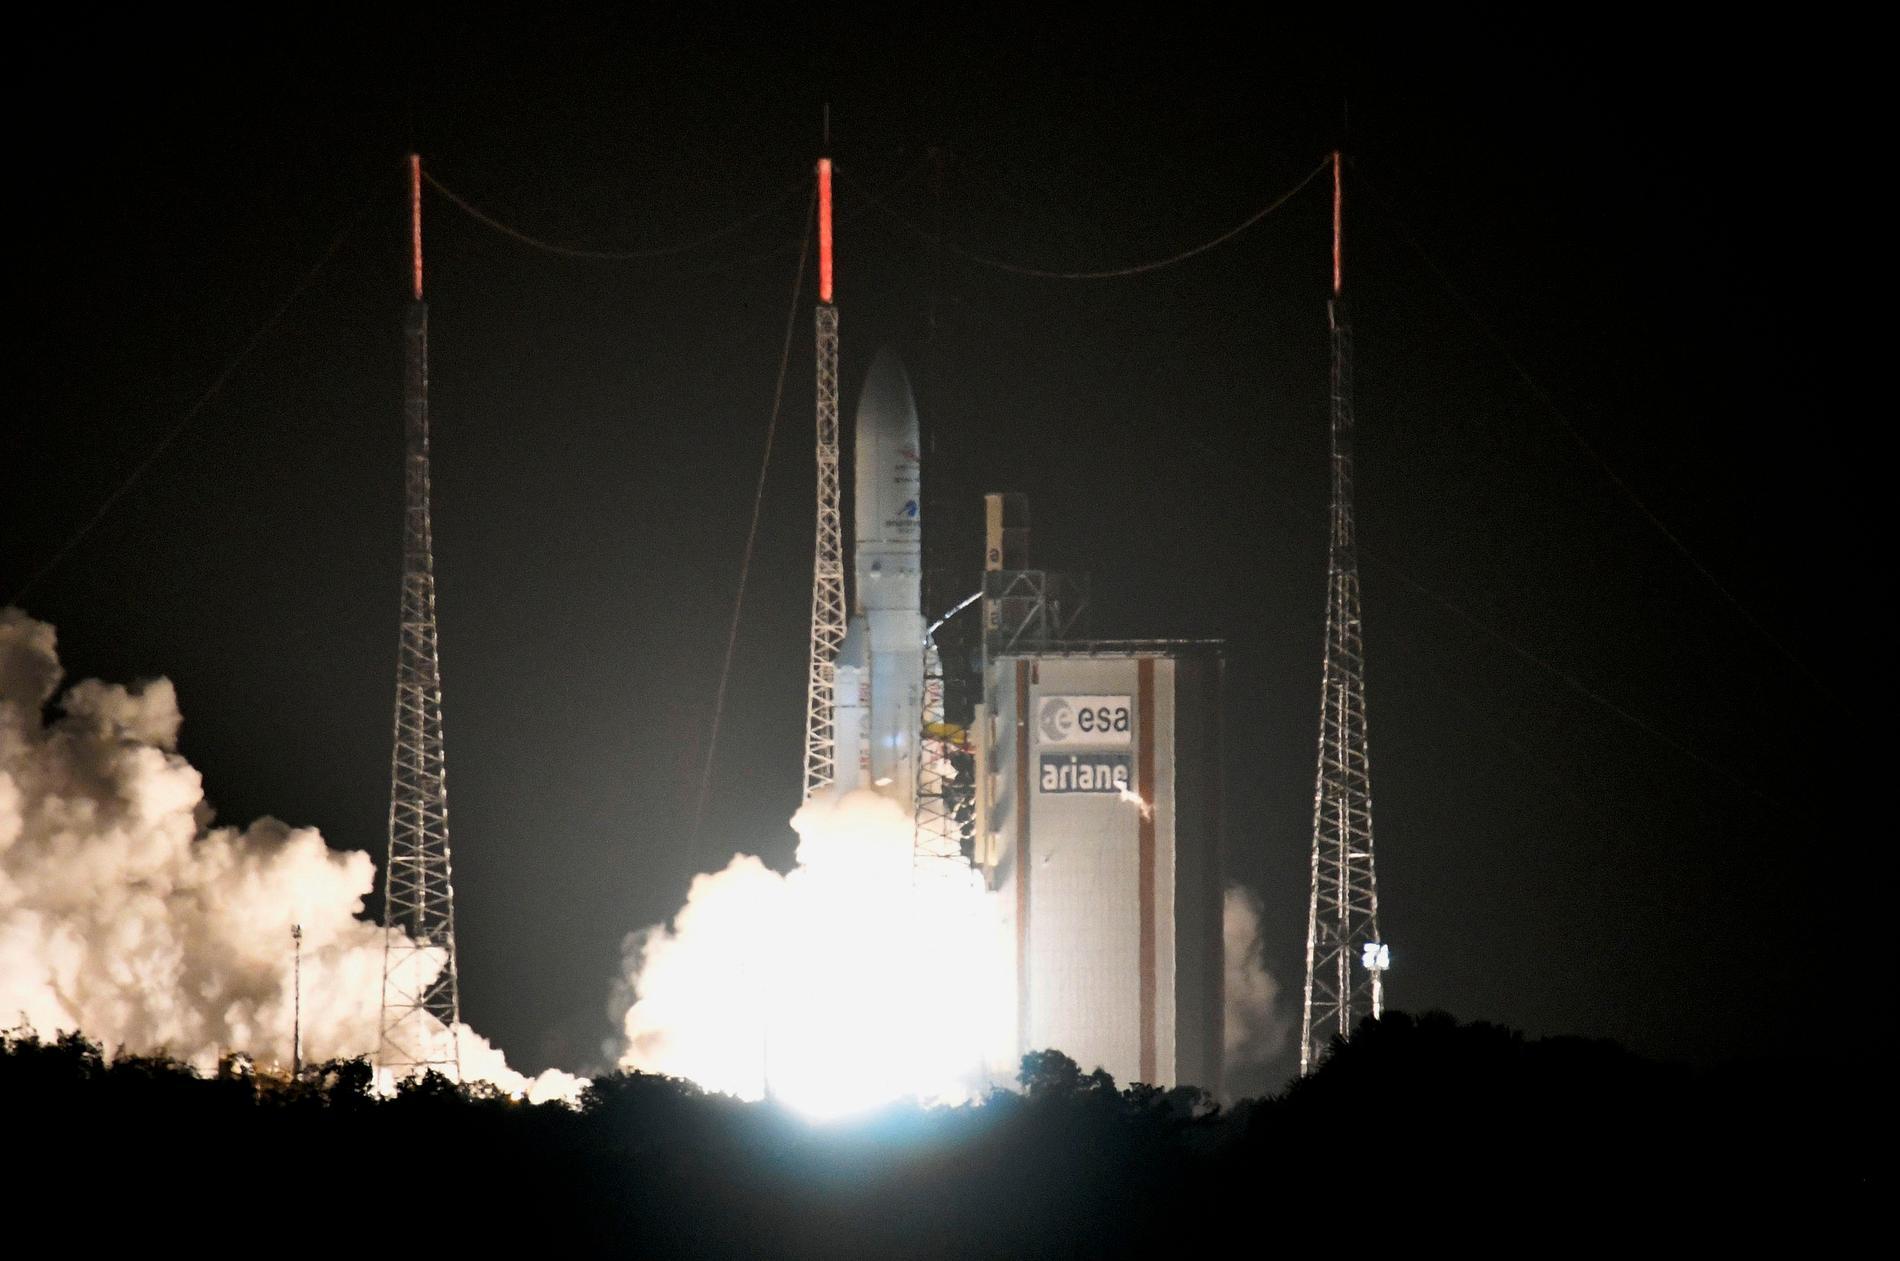 Raketen Ariane 5 har skickat upp den omprogrammerbara satelliten Eutelsat Quantum i omloppsbana runt jorden. Arkivbild.